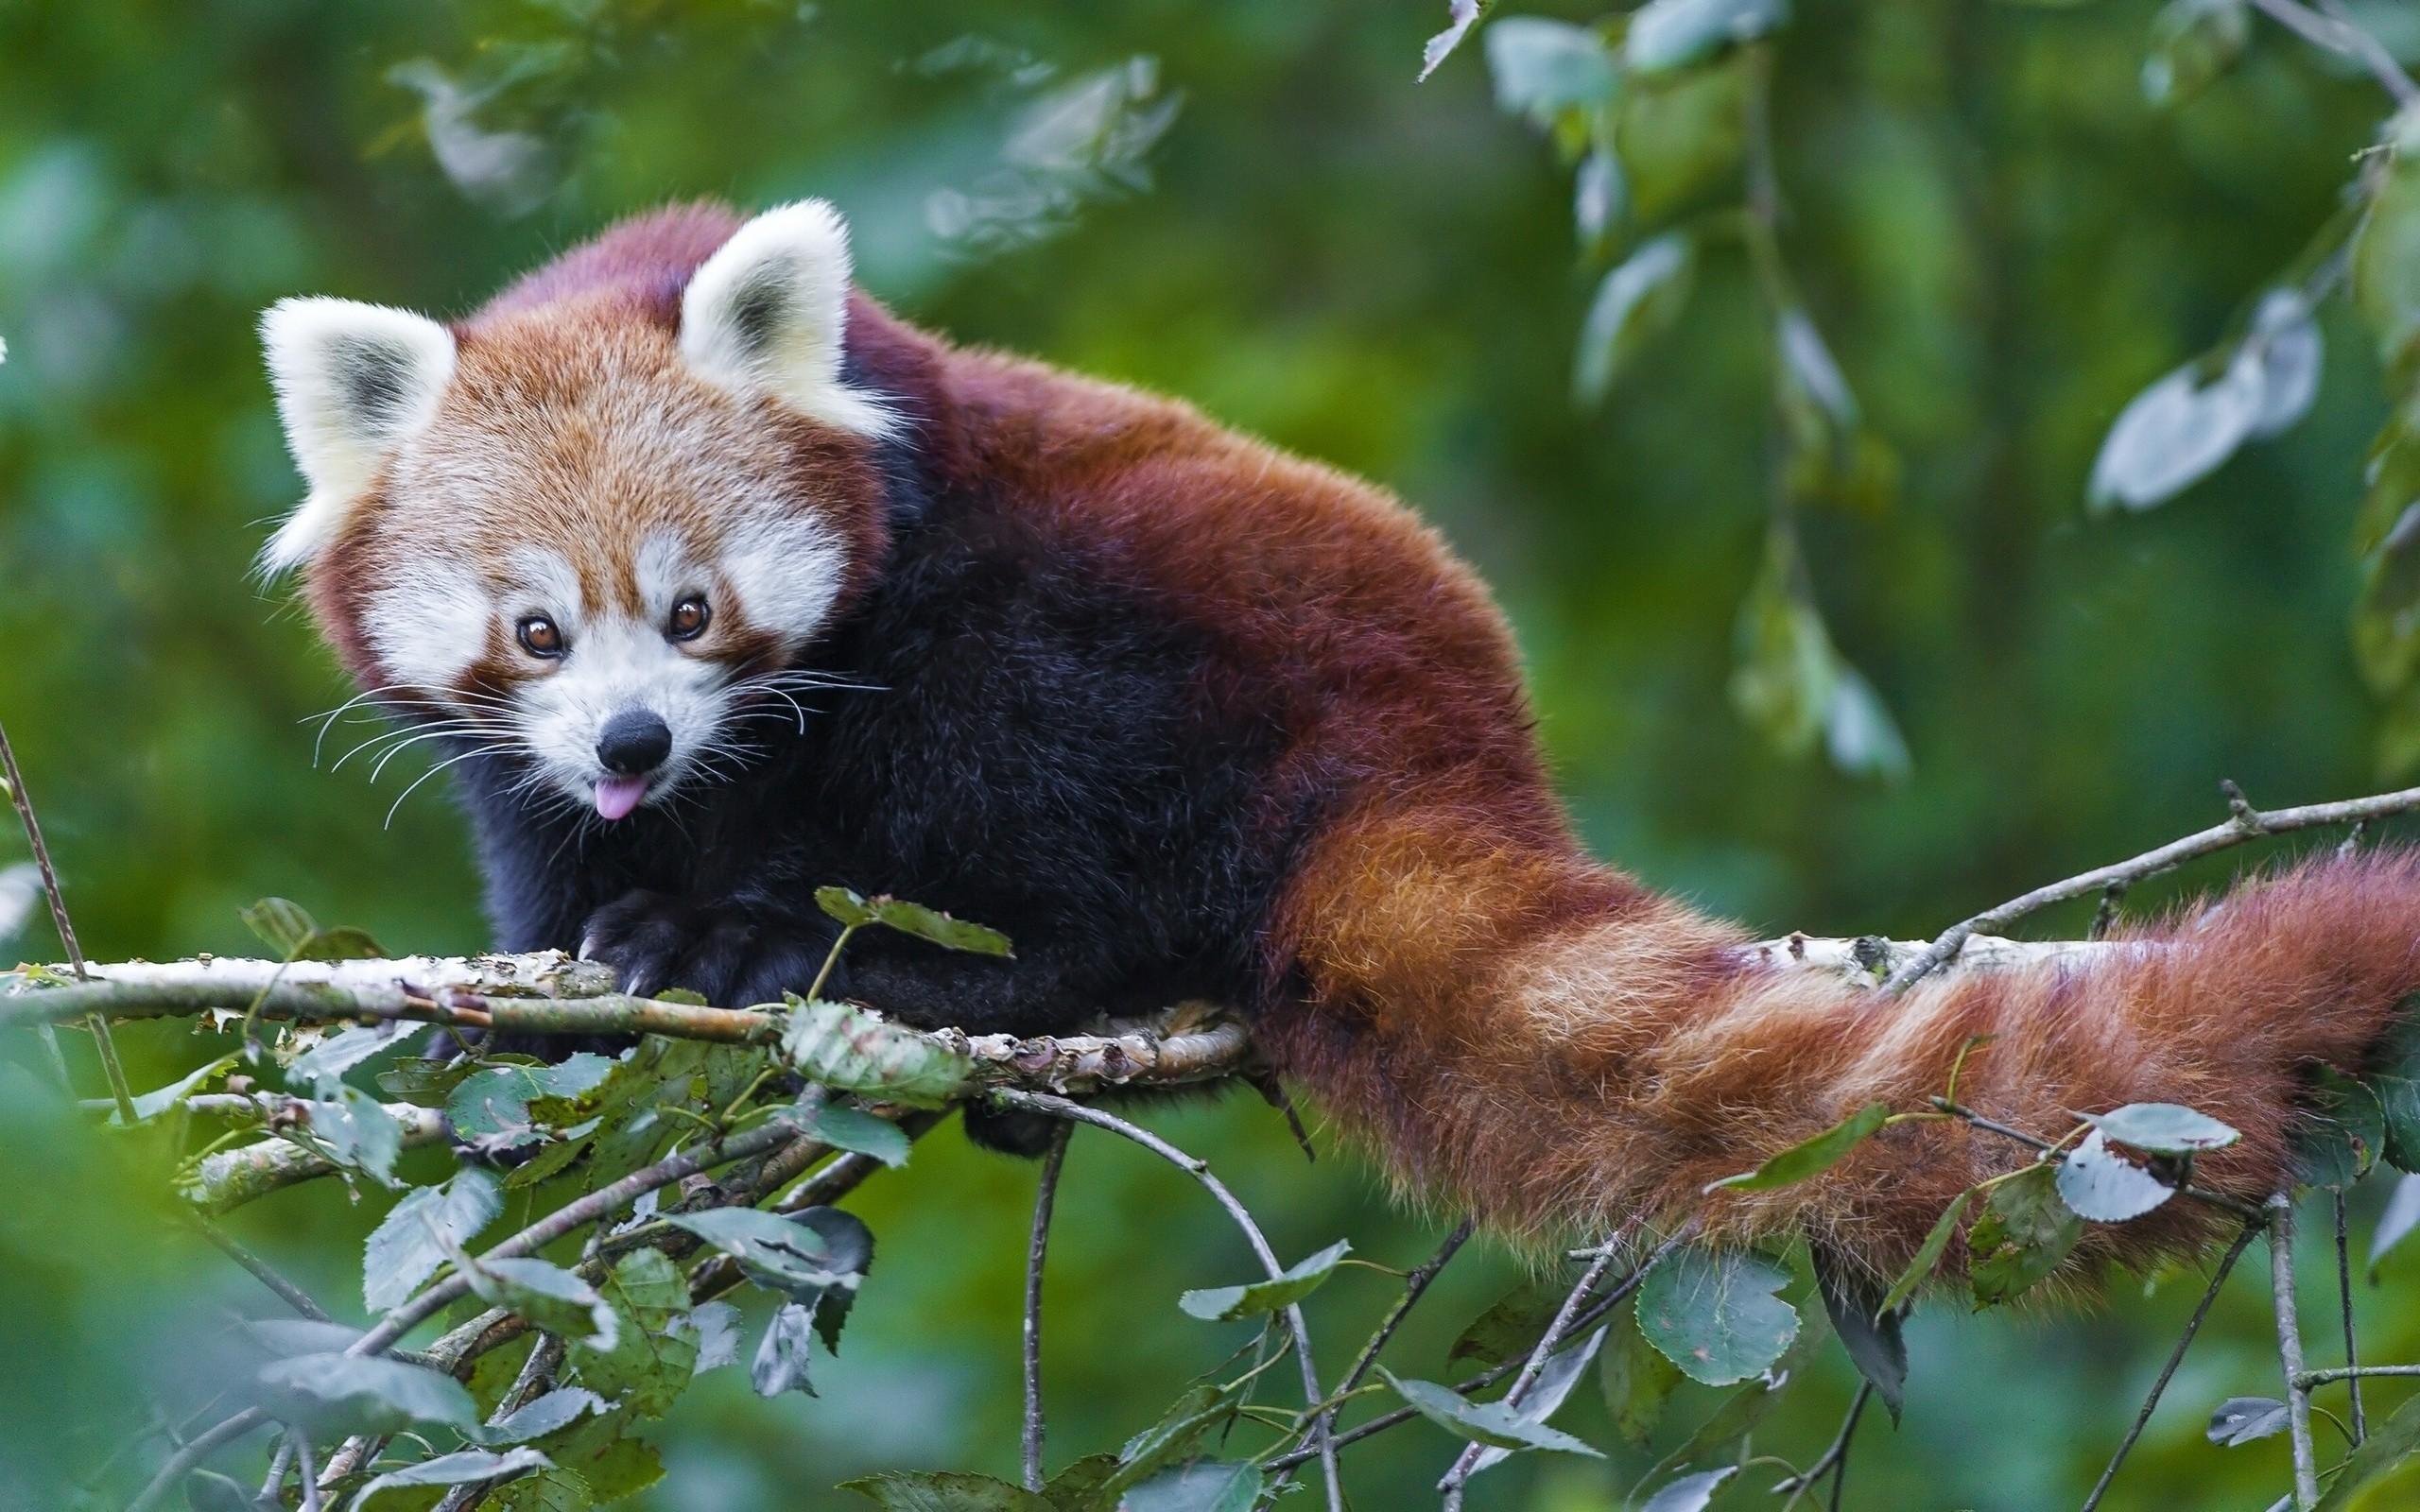 … Goofy red panda